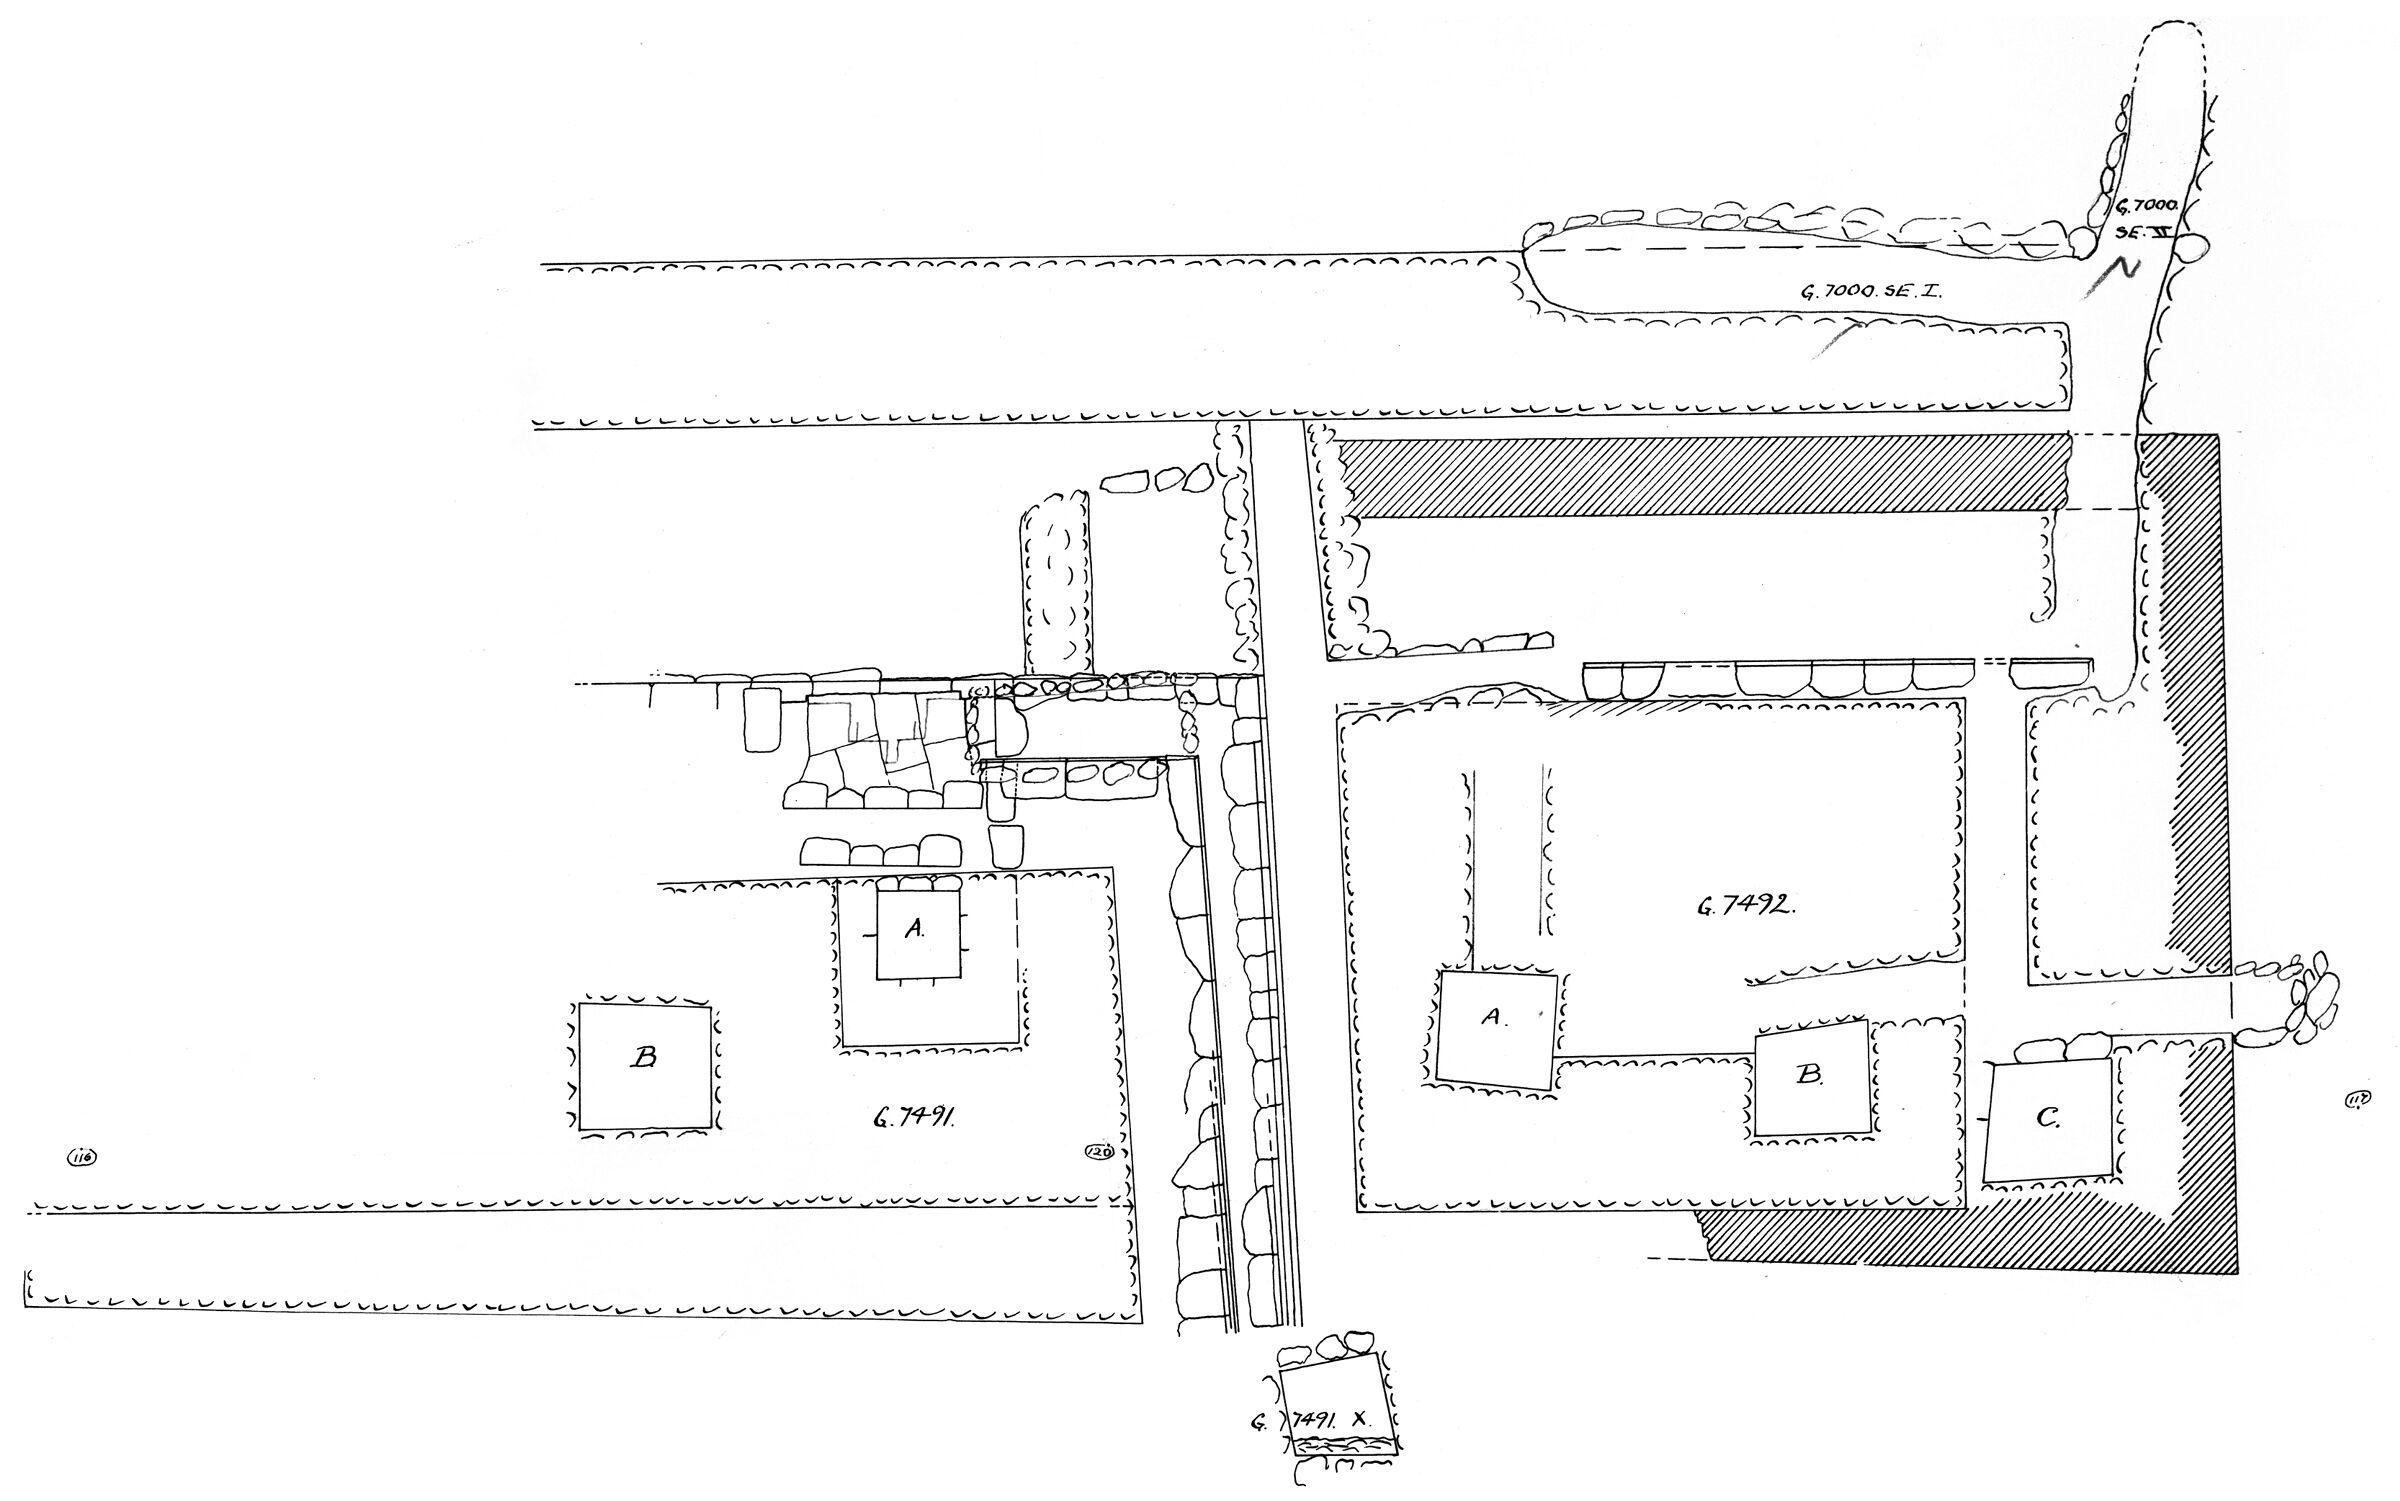 Maps and plans: Plan of G 7491 and G 7492, with G 7000 SE 1 and G 7000 SE 2